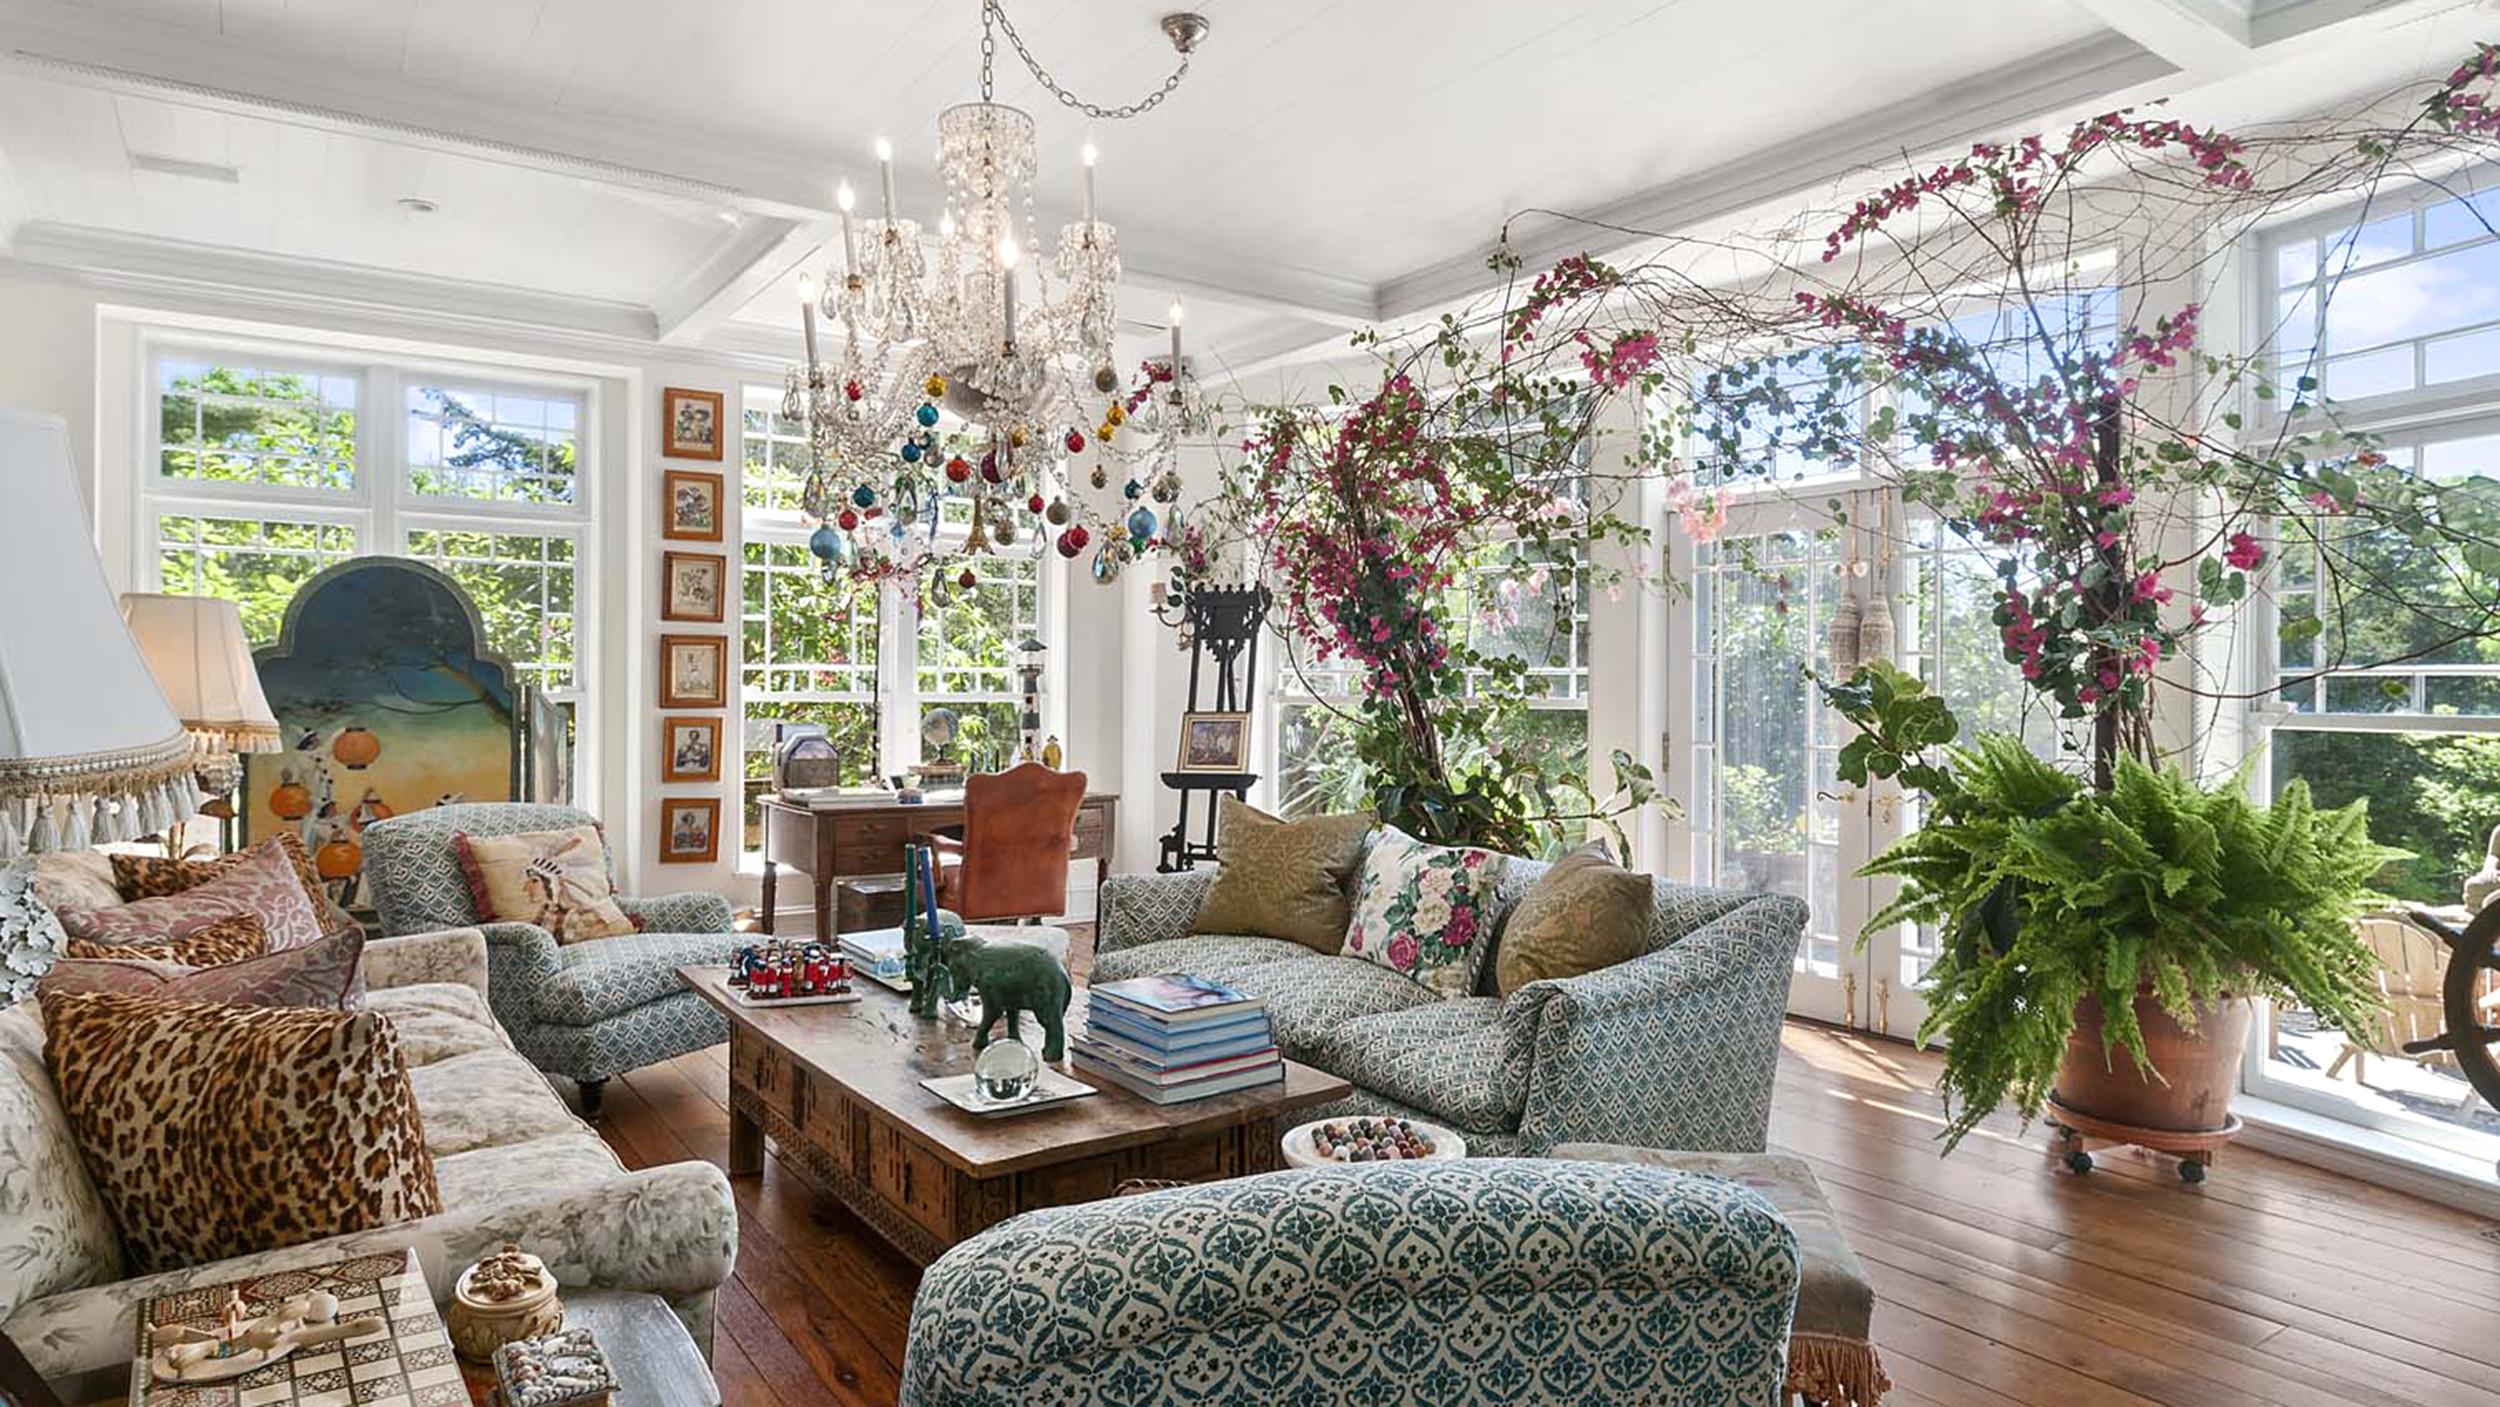 Christie Brinkley is selling her Hamptons estate  see inside  TODAYcom